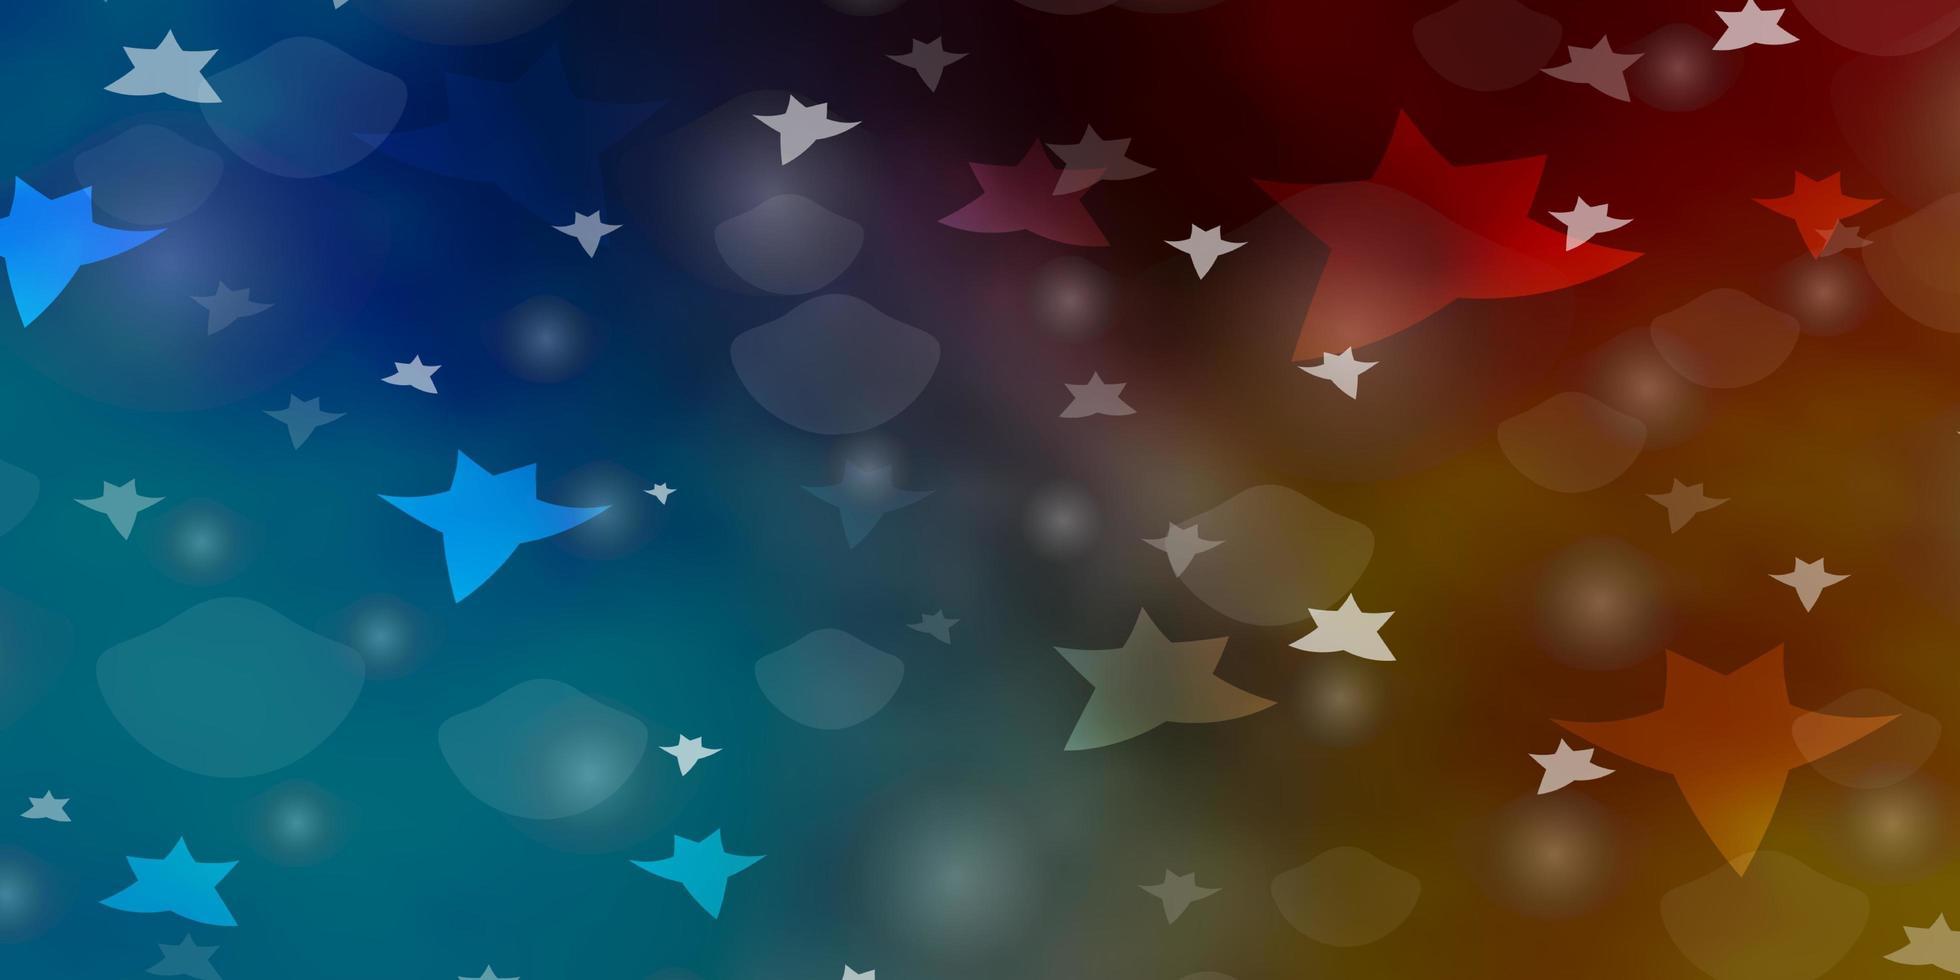 hellblaues, gelbes Muster mit Kreisen, Sternen. vektor